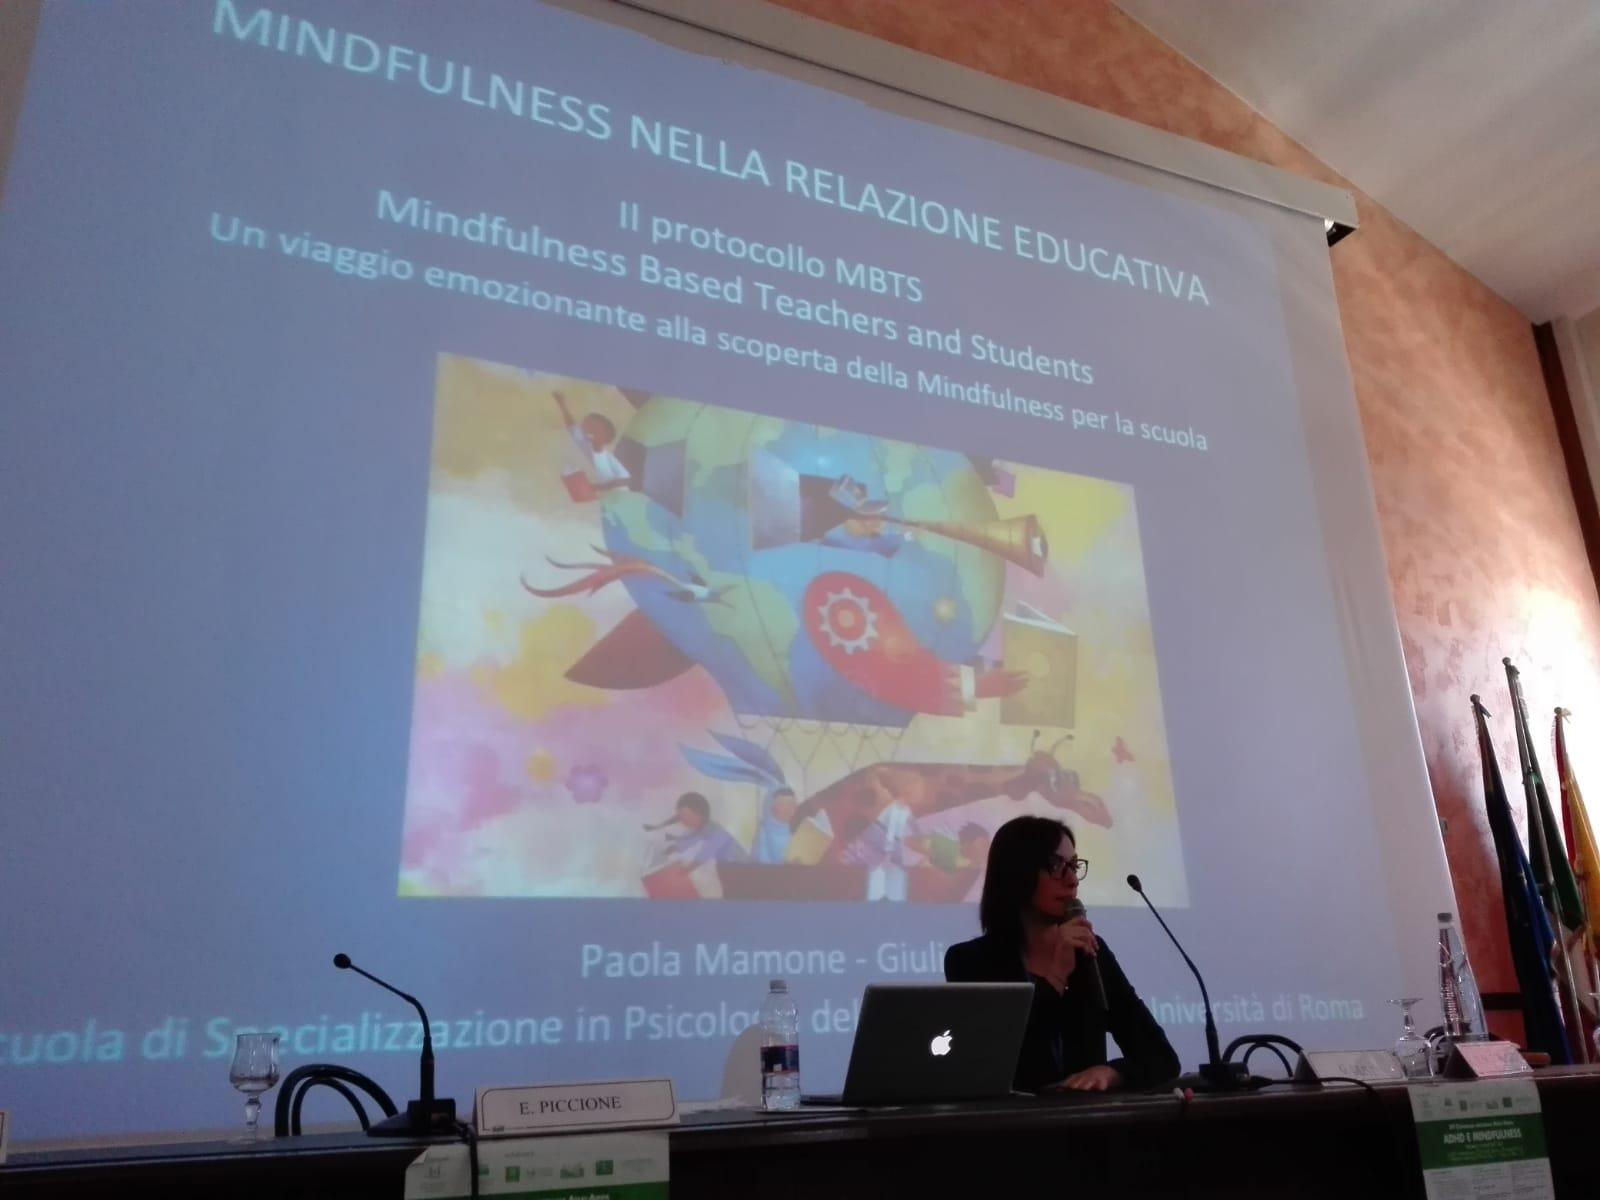 congresso ADHD e mindfulness